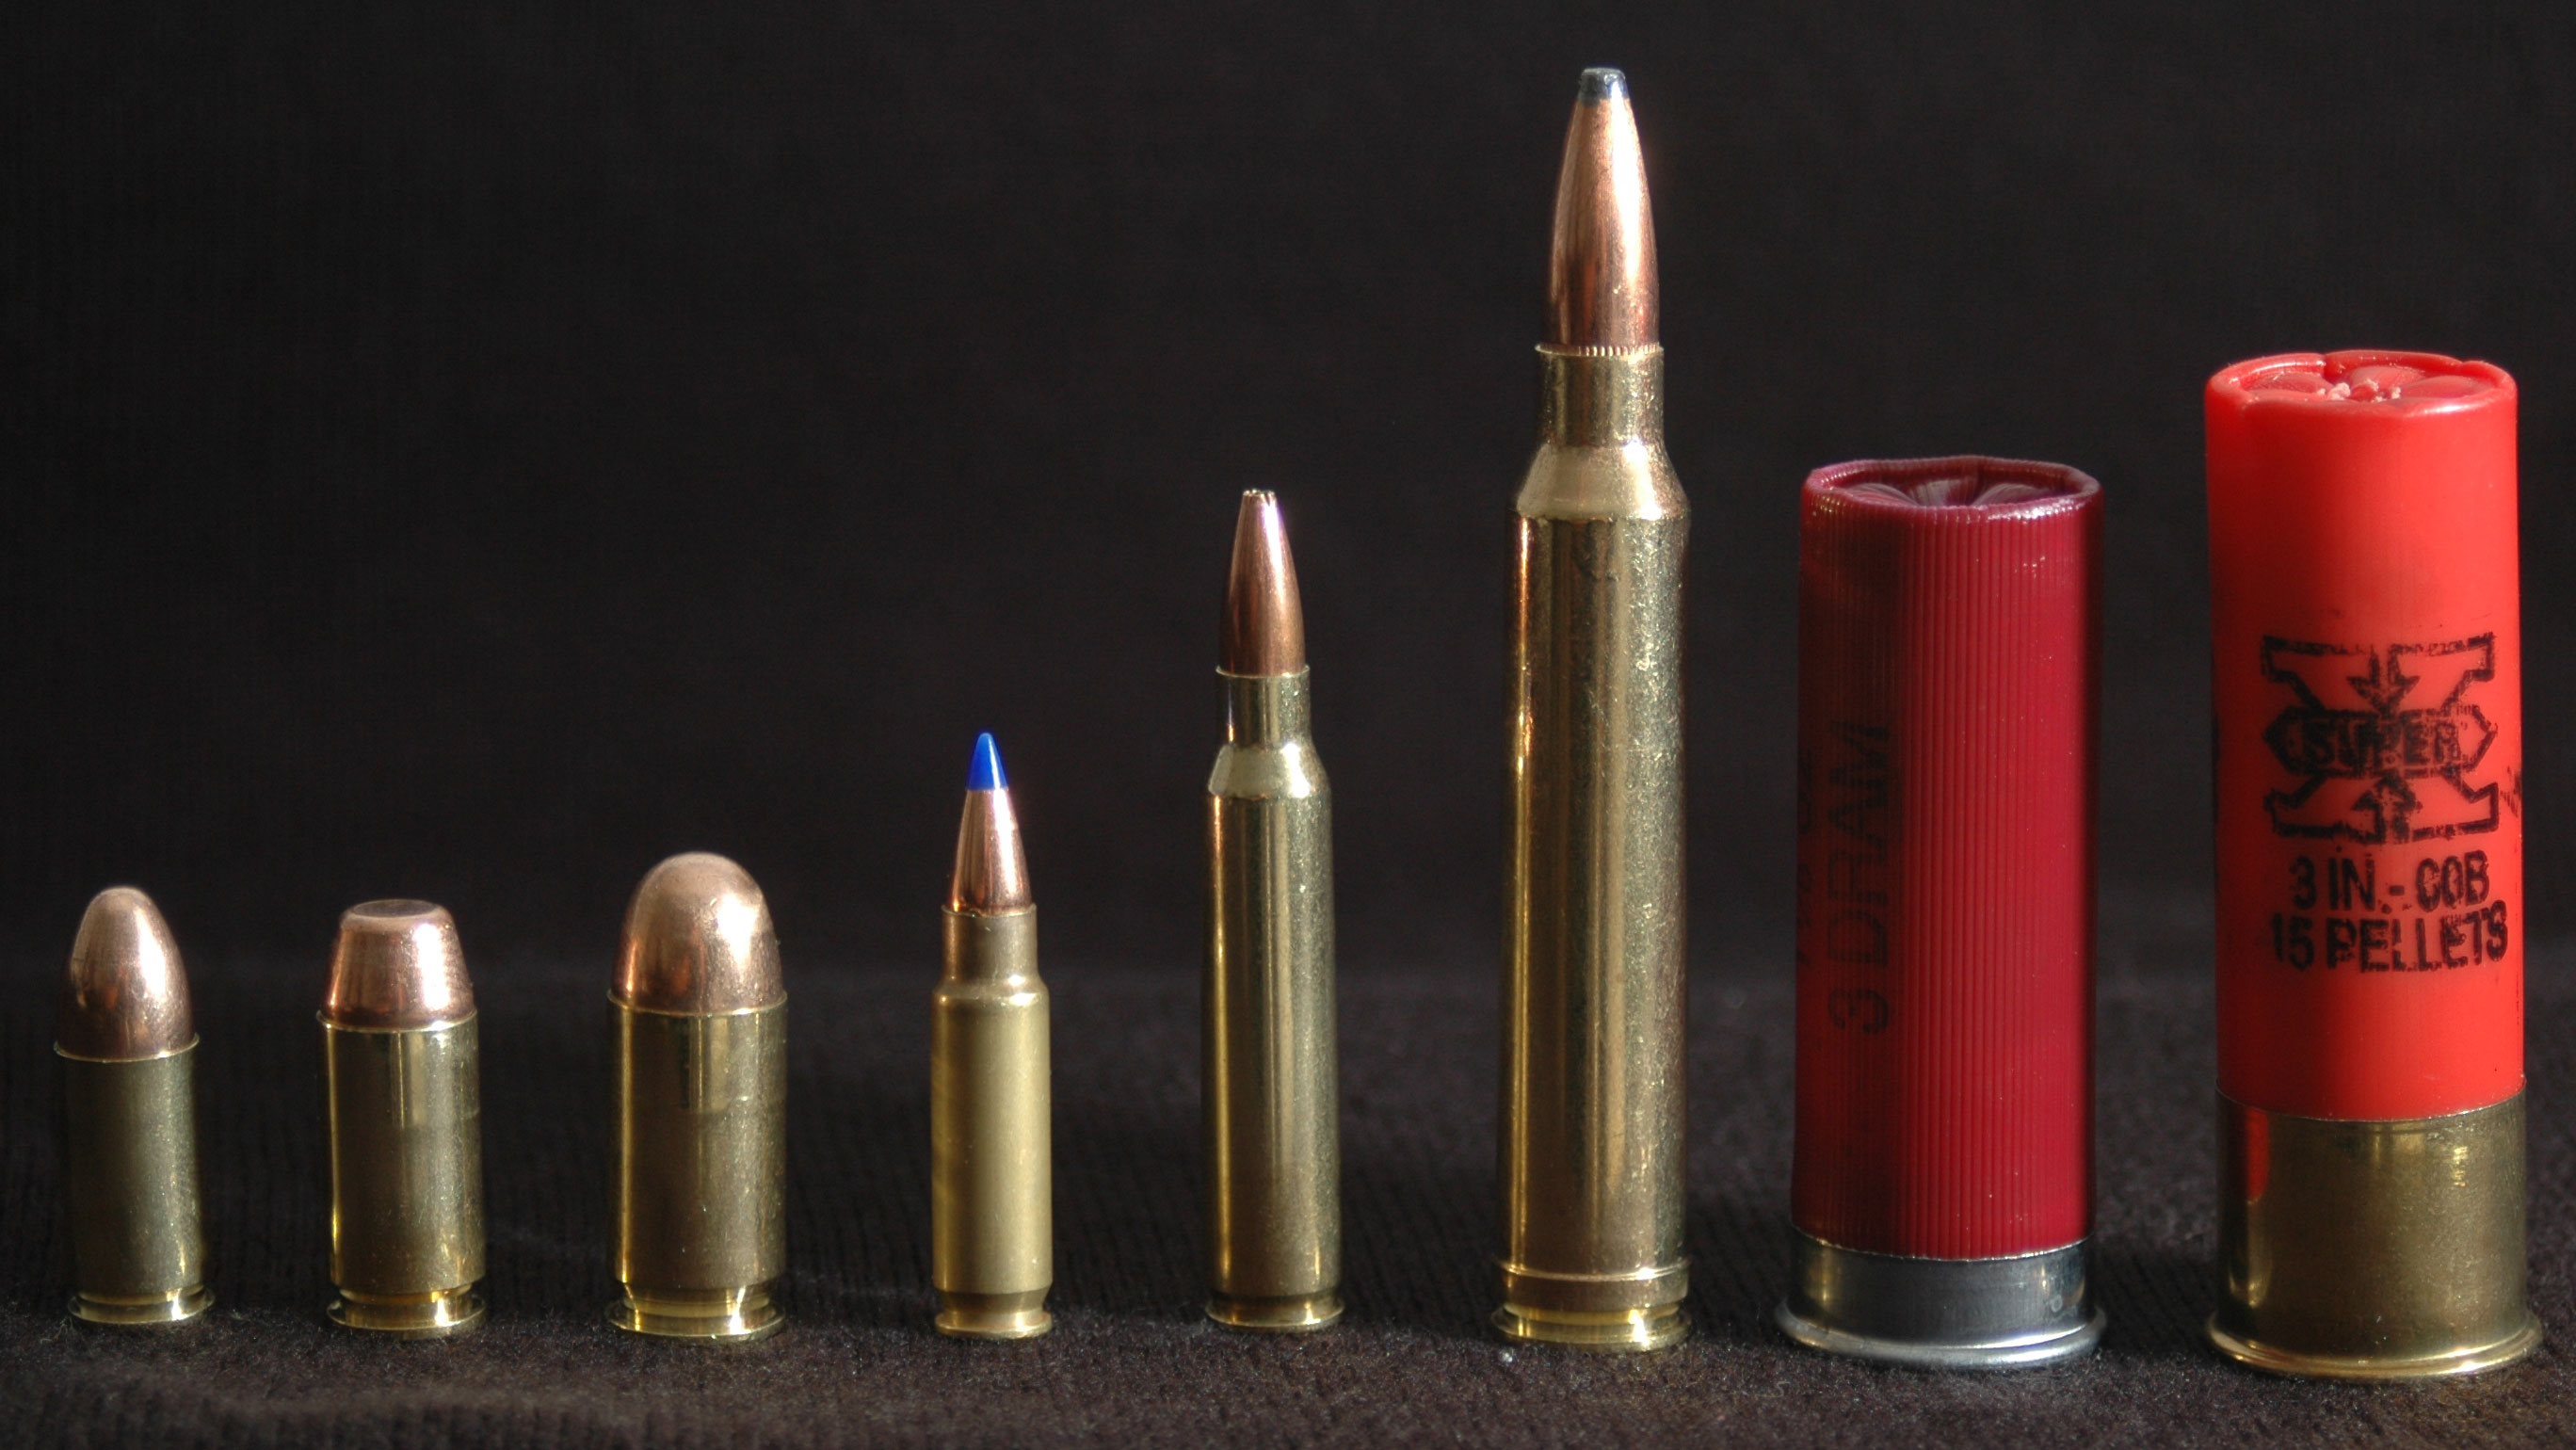 File:Many bullets.jpg - Wikimedia Commons